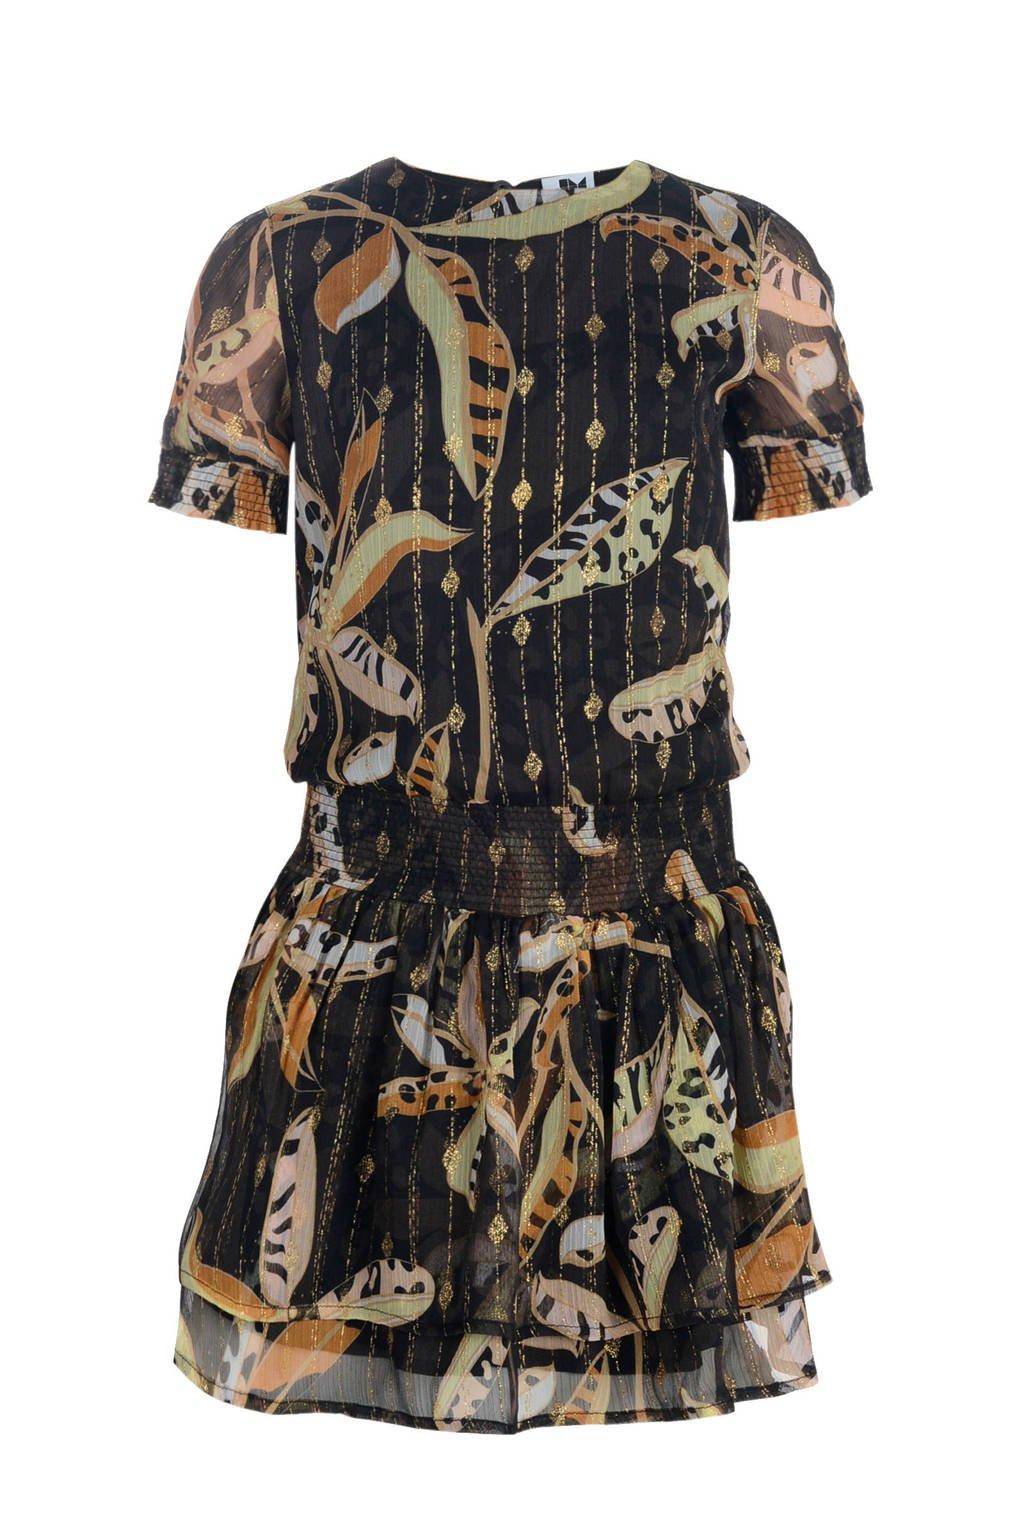 JILL MITCH jurk Tara zwart/goud/lichtgeel, Zwart/goud/lichtgeel